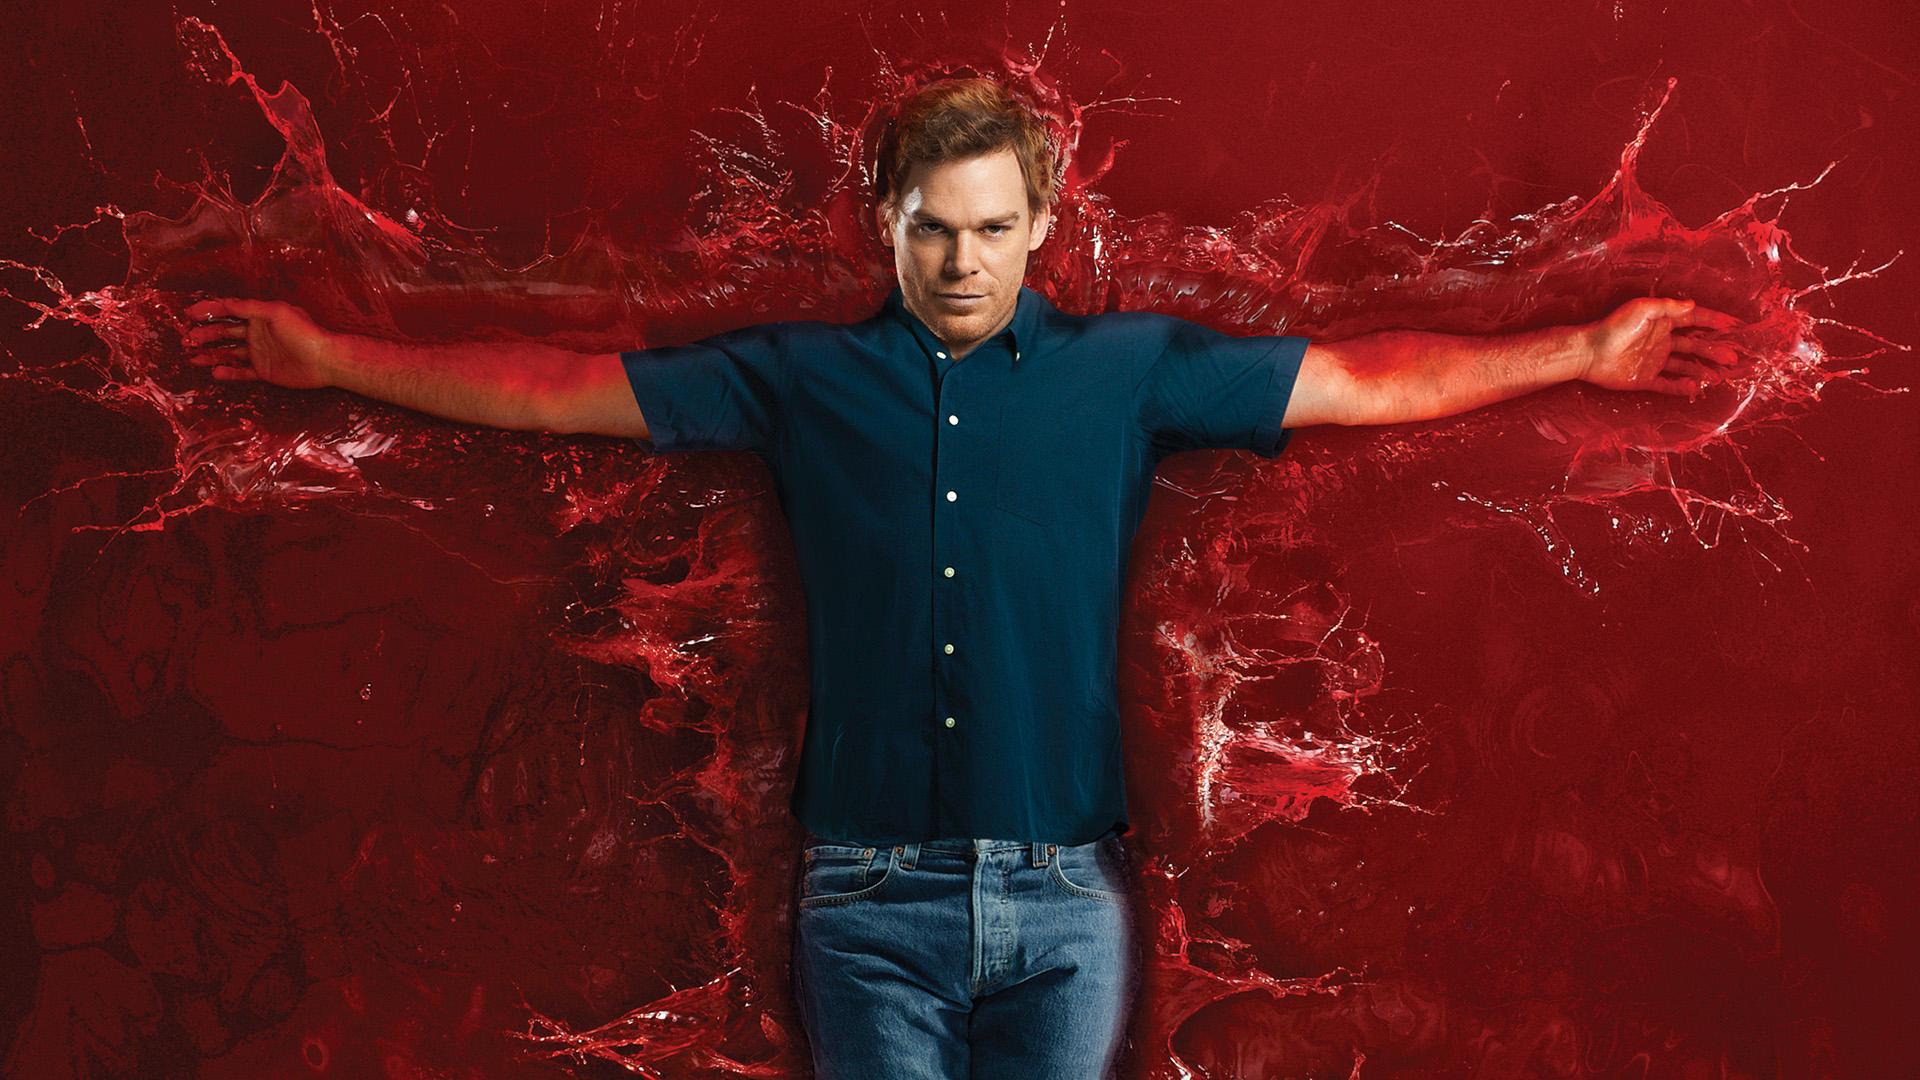 Dexter|Colección 1-8|Latino-Ingles|1080p|96/96|x265 10bit|+ Soundtracks  Banner